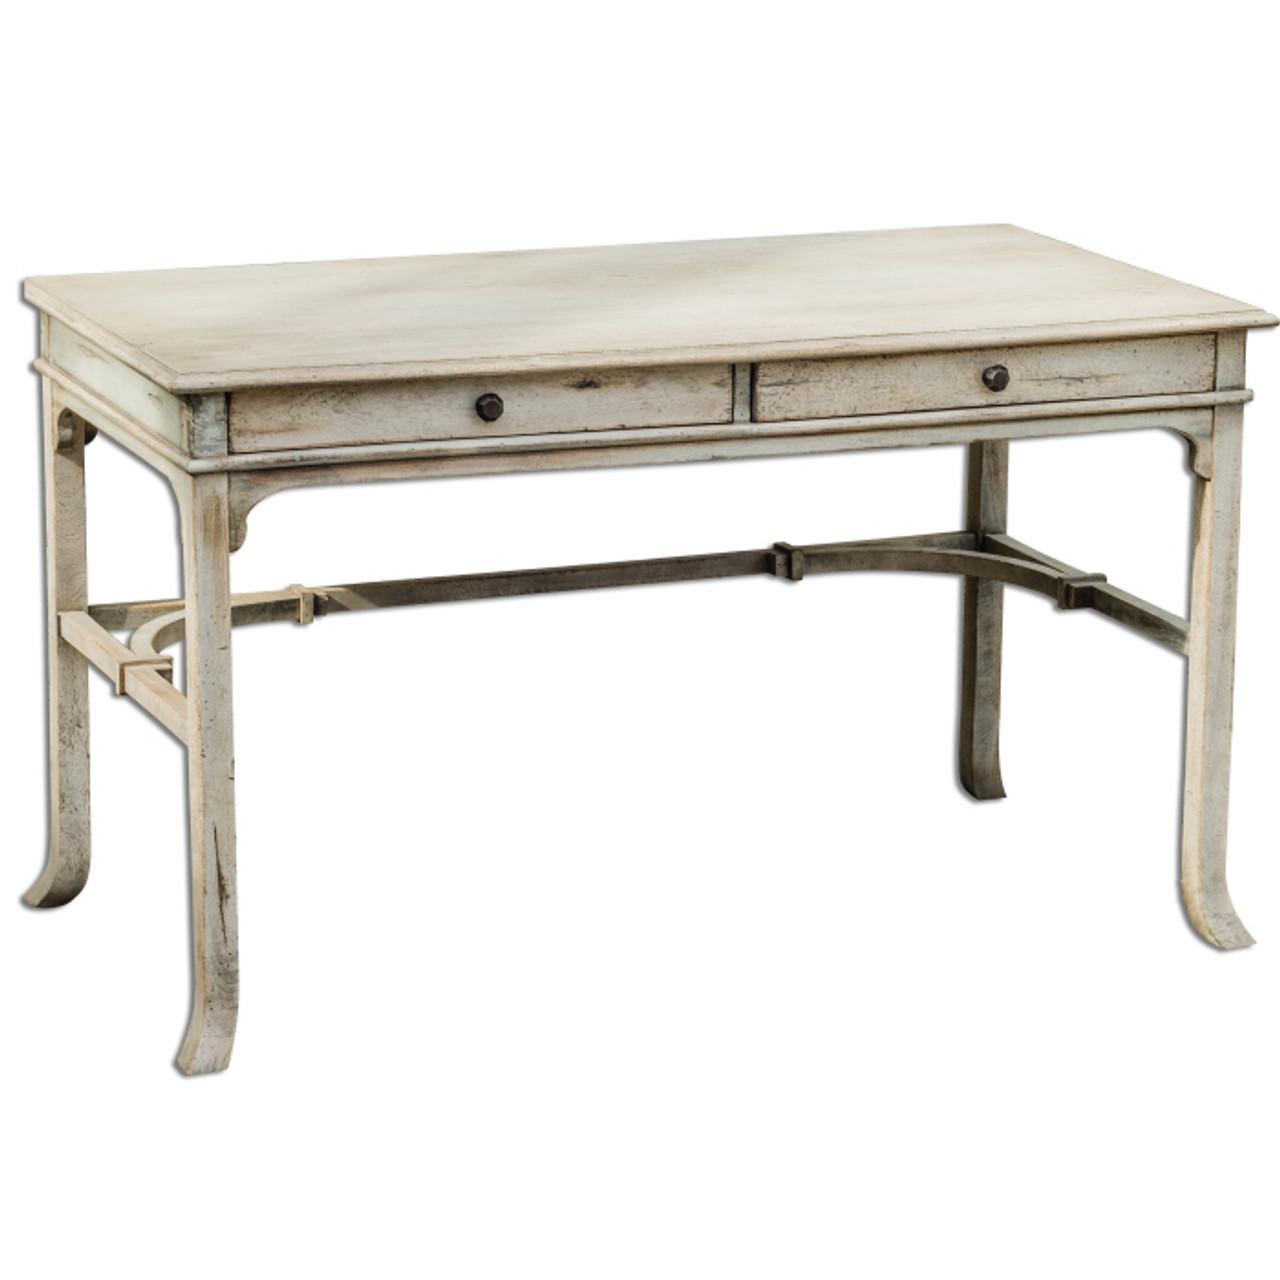 shabby chic desk - Antiqued White Bridgely Rustic Wood Vintage Writing Desk Zin Home